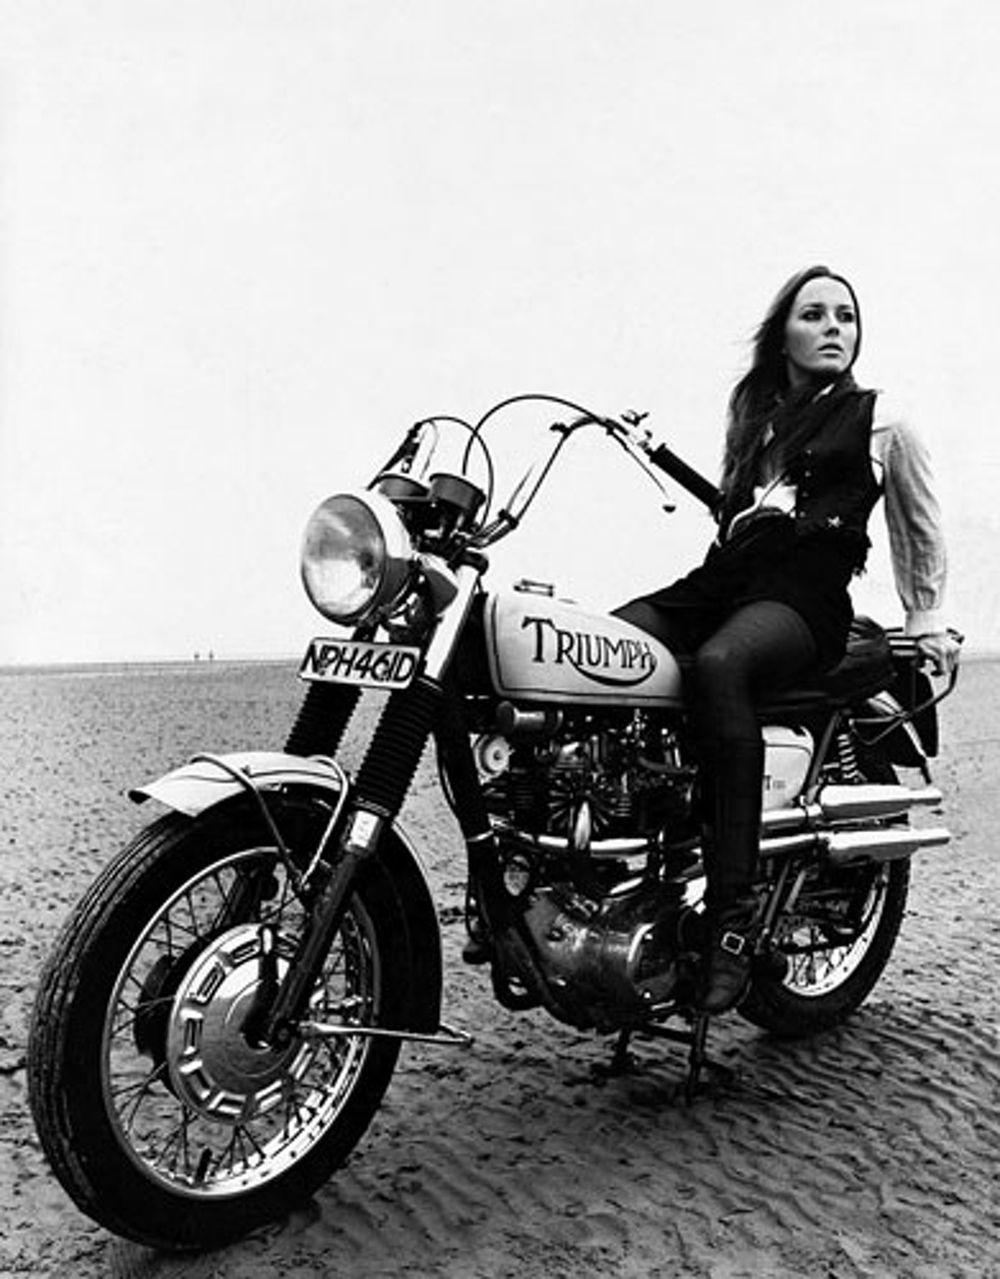 70s triumph great black white shot more bikes visit vintage cruising triumph vintagecruising motorcycles